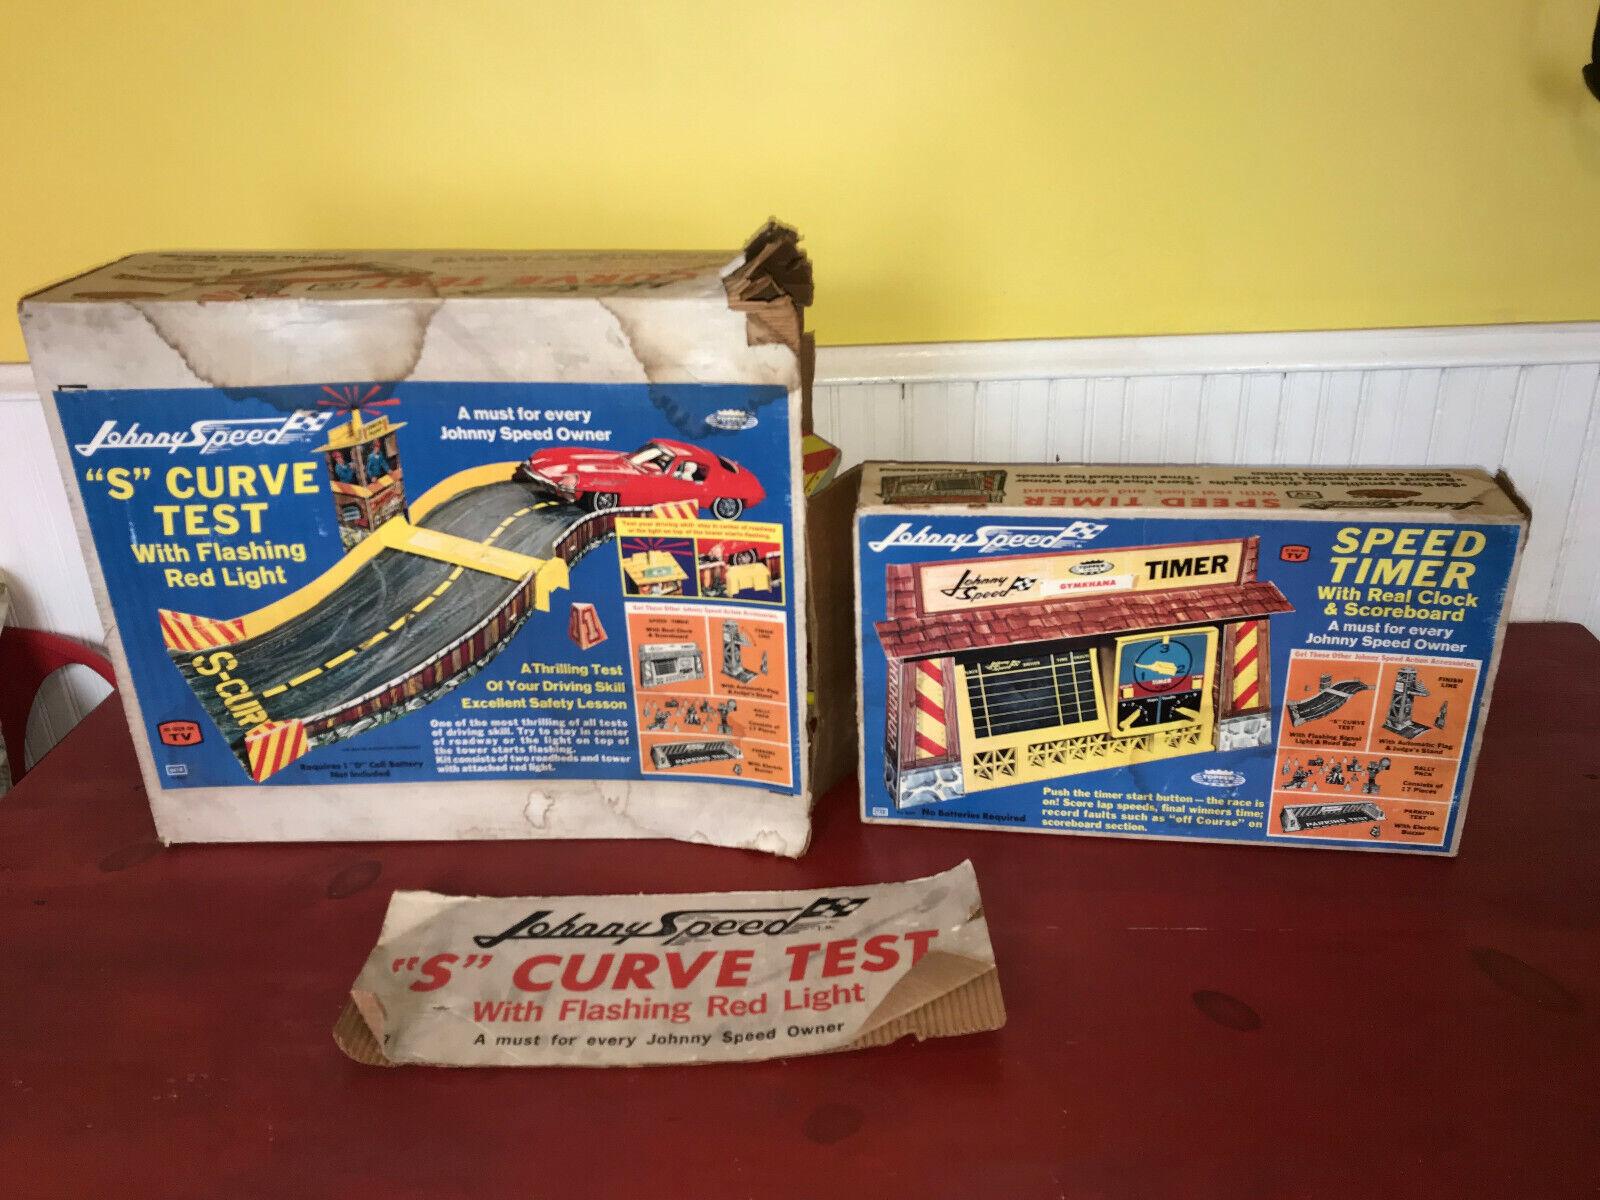 Vintage 1960's Topper Toys Johnny Speed Speed Timer & S Curve Test Set Lot